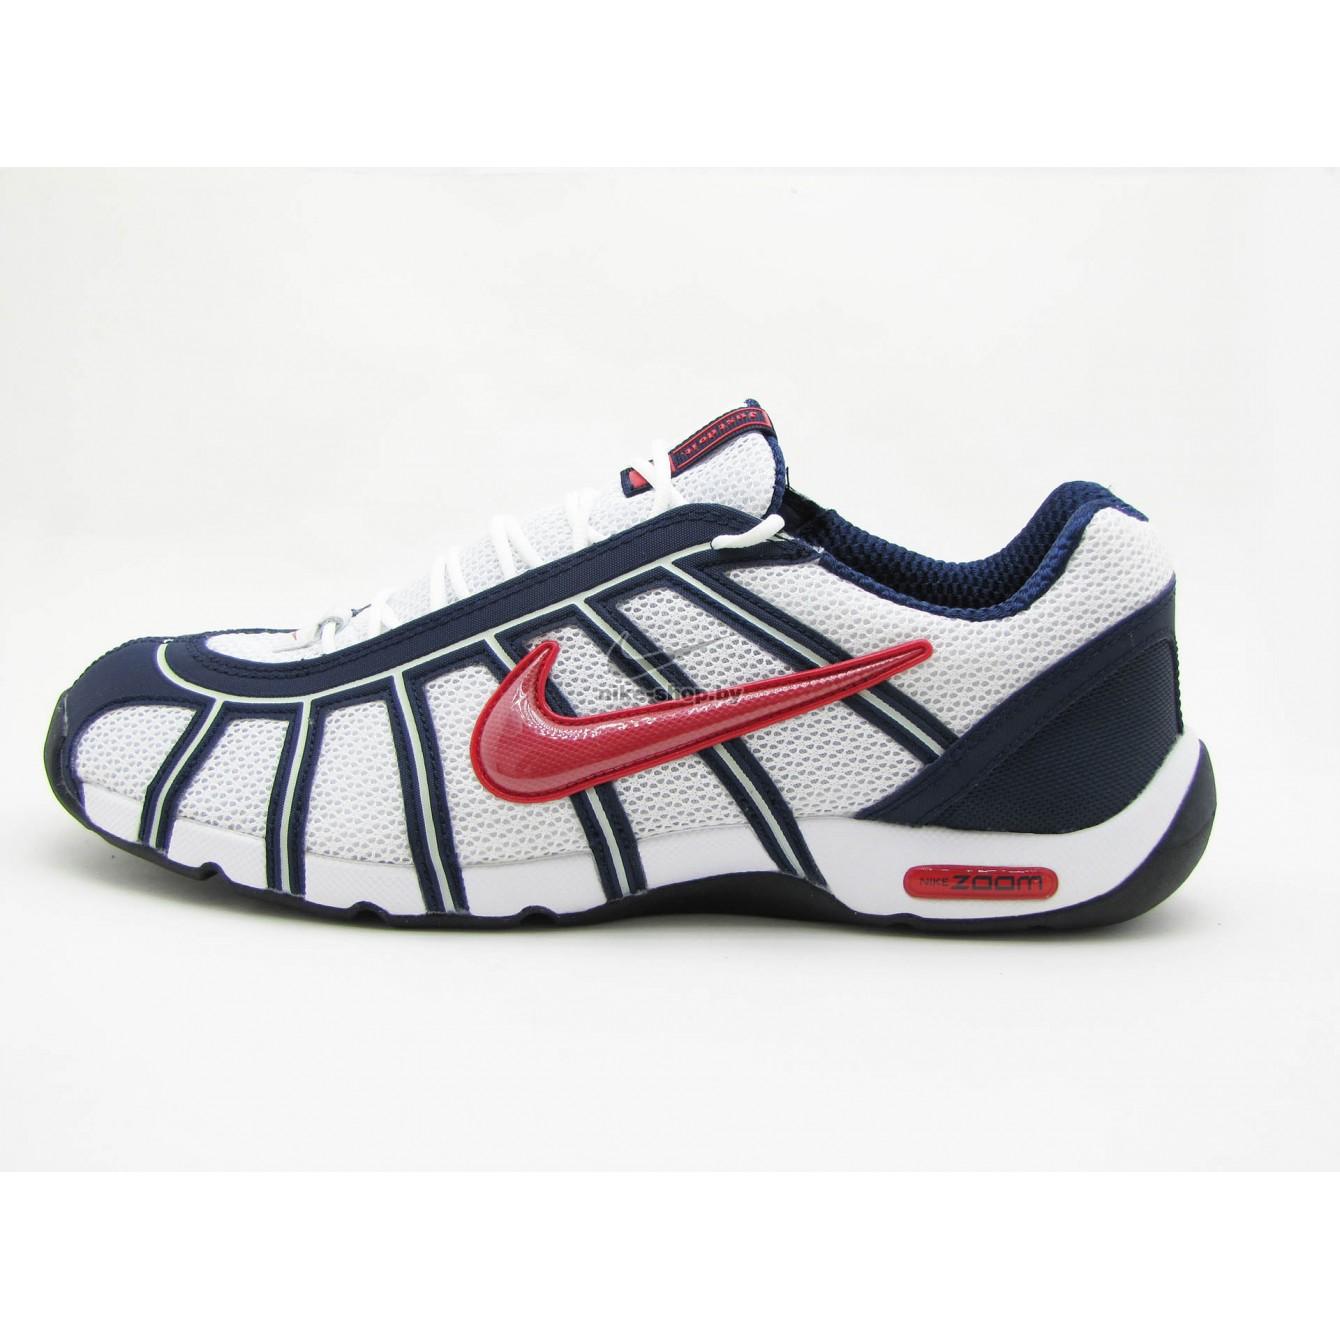 88880984bd1 Обувь для фехтования NIKE AIR ZOOM FENCER в интернет-магазине nike-shop